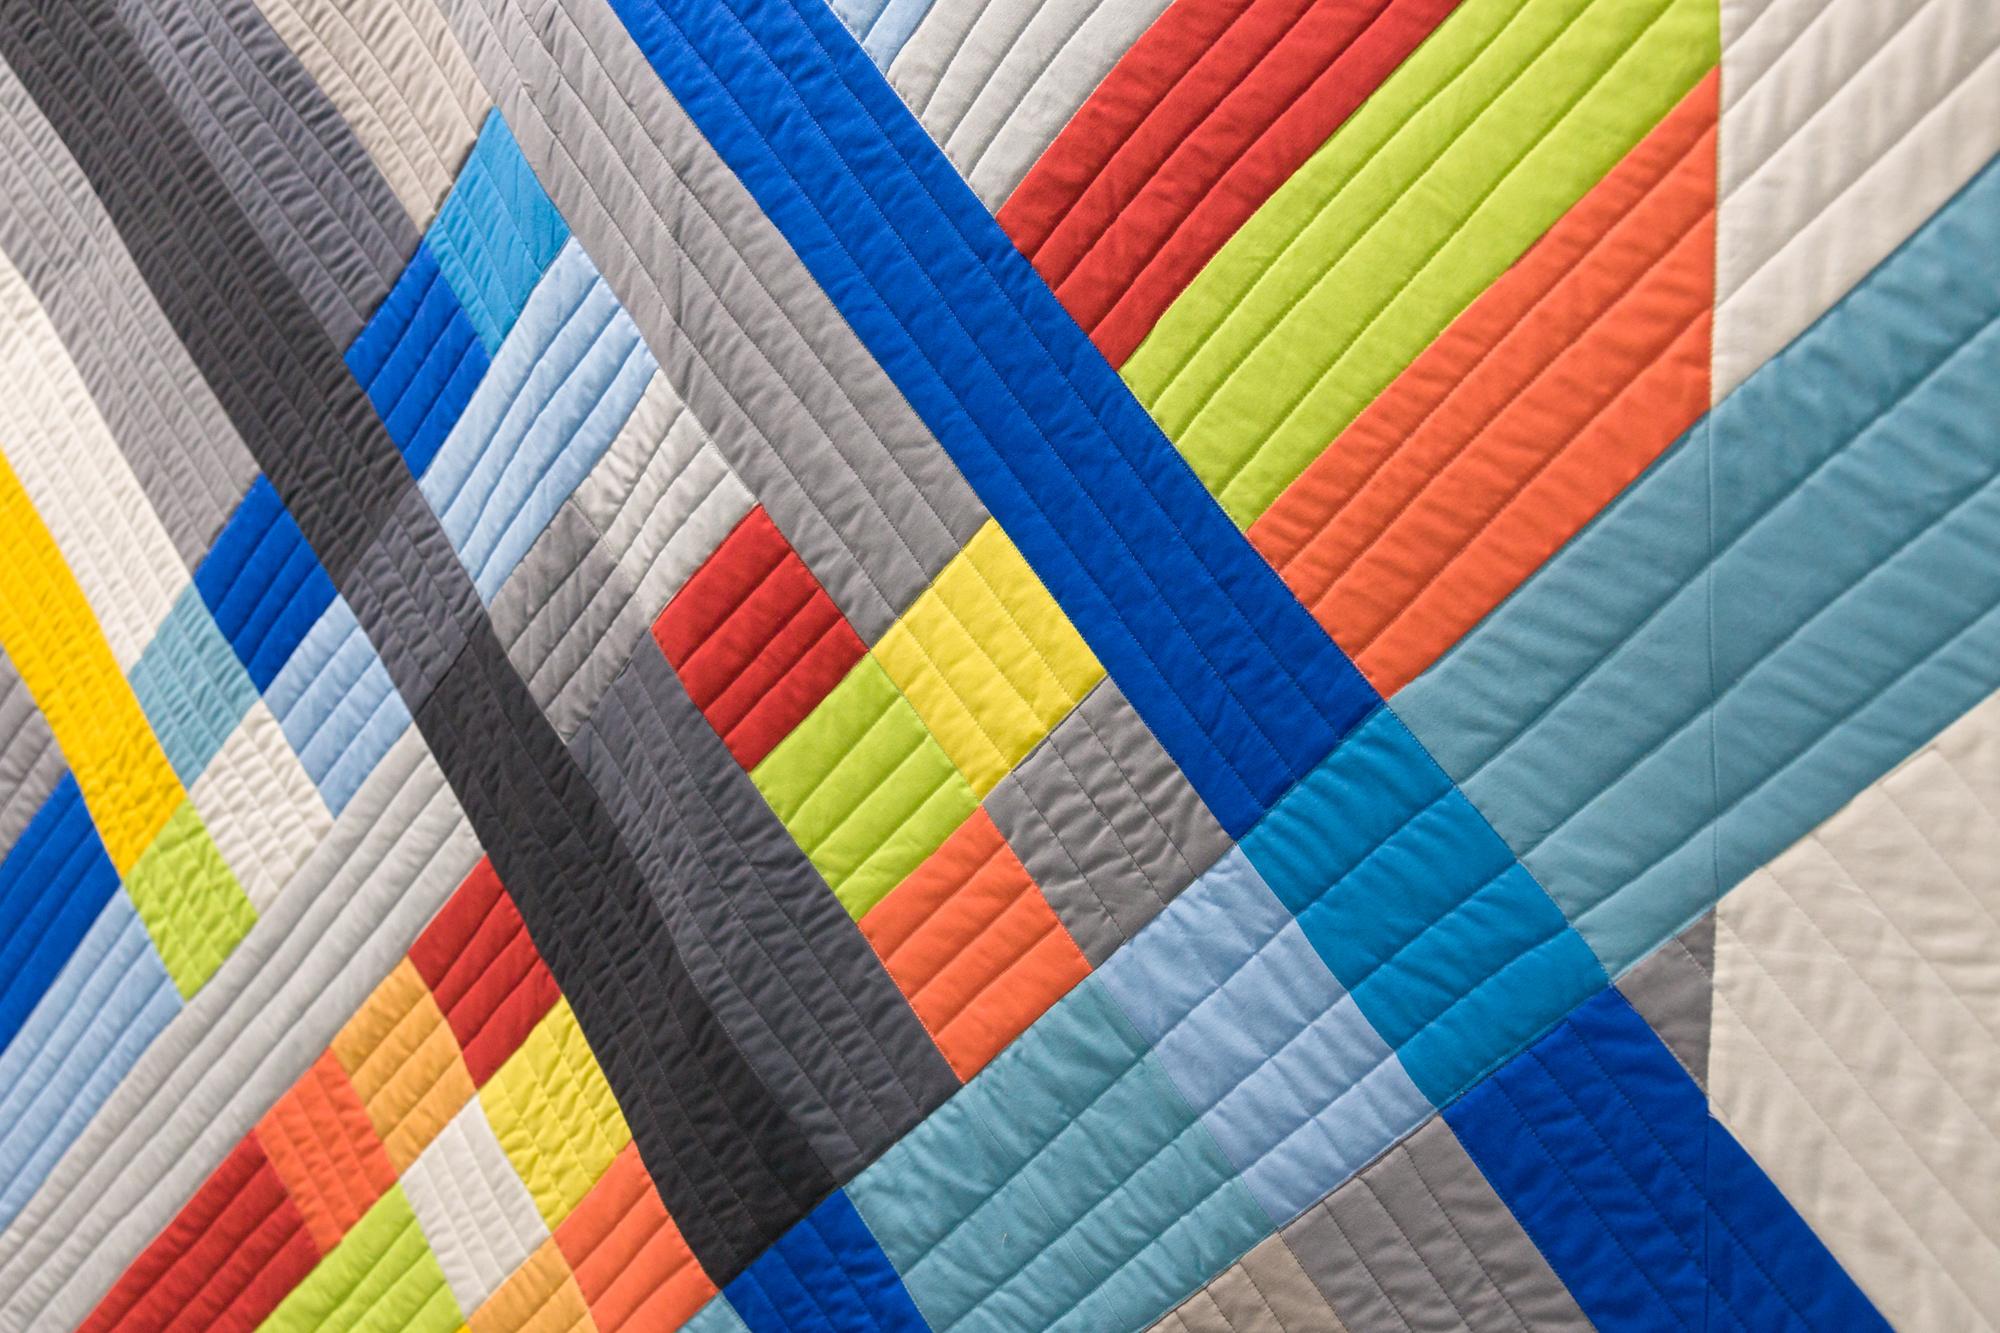 RK_QMfall17_Kona colors wall_09.jpg